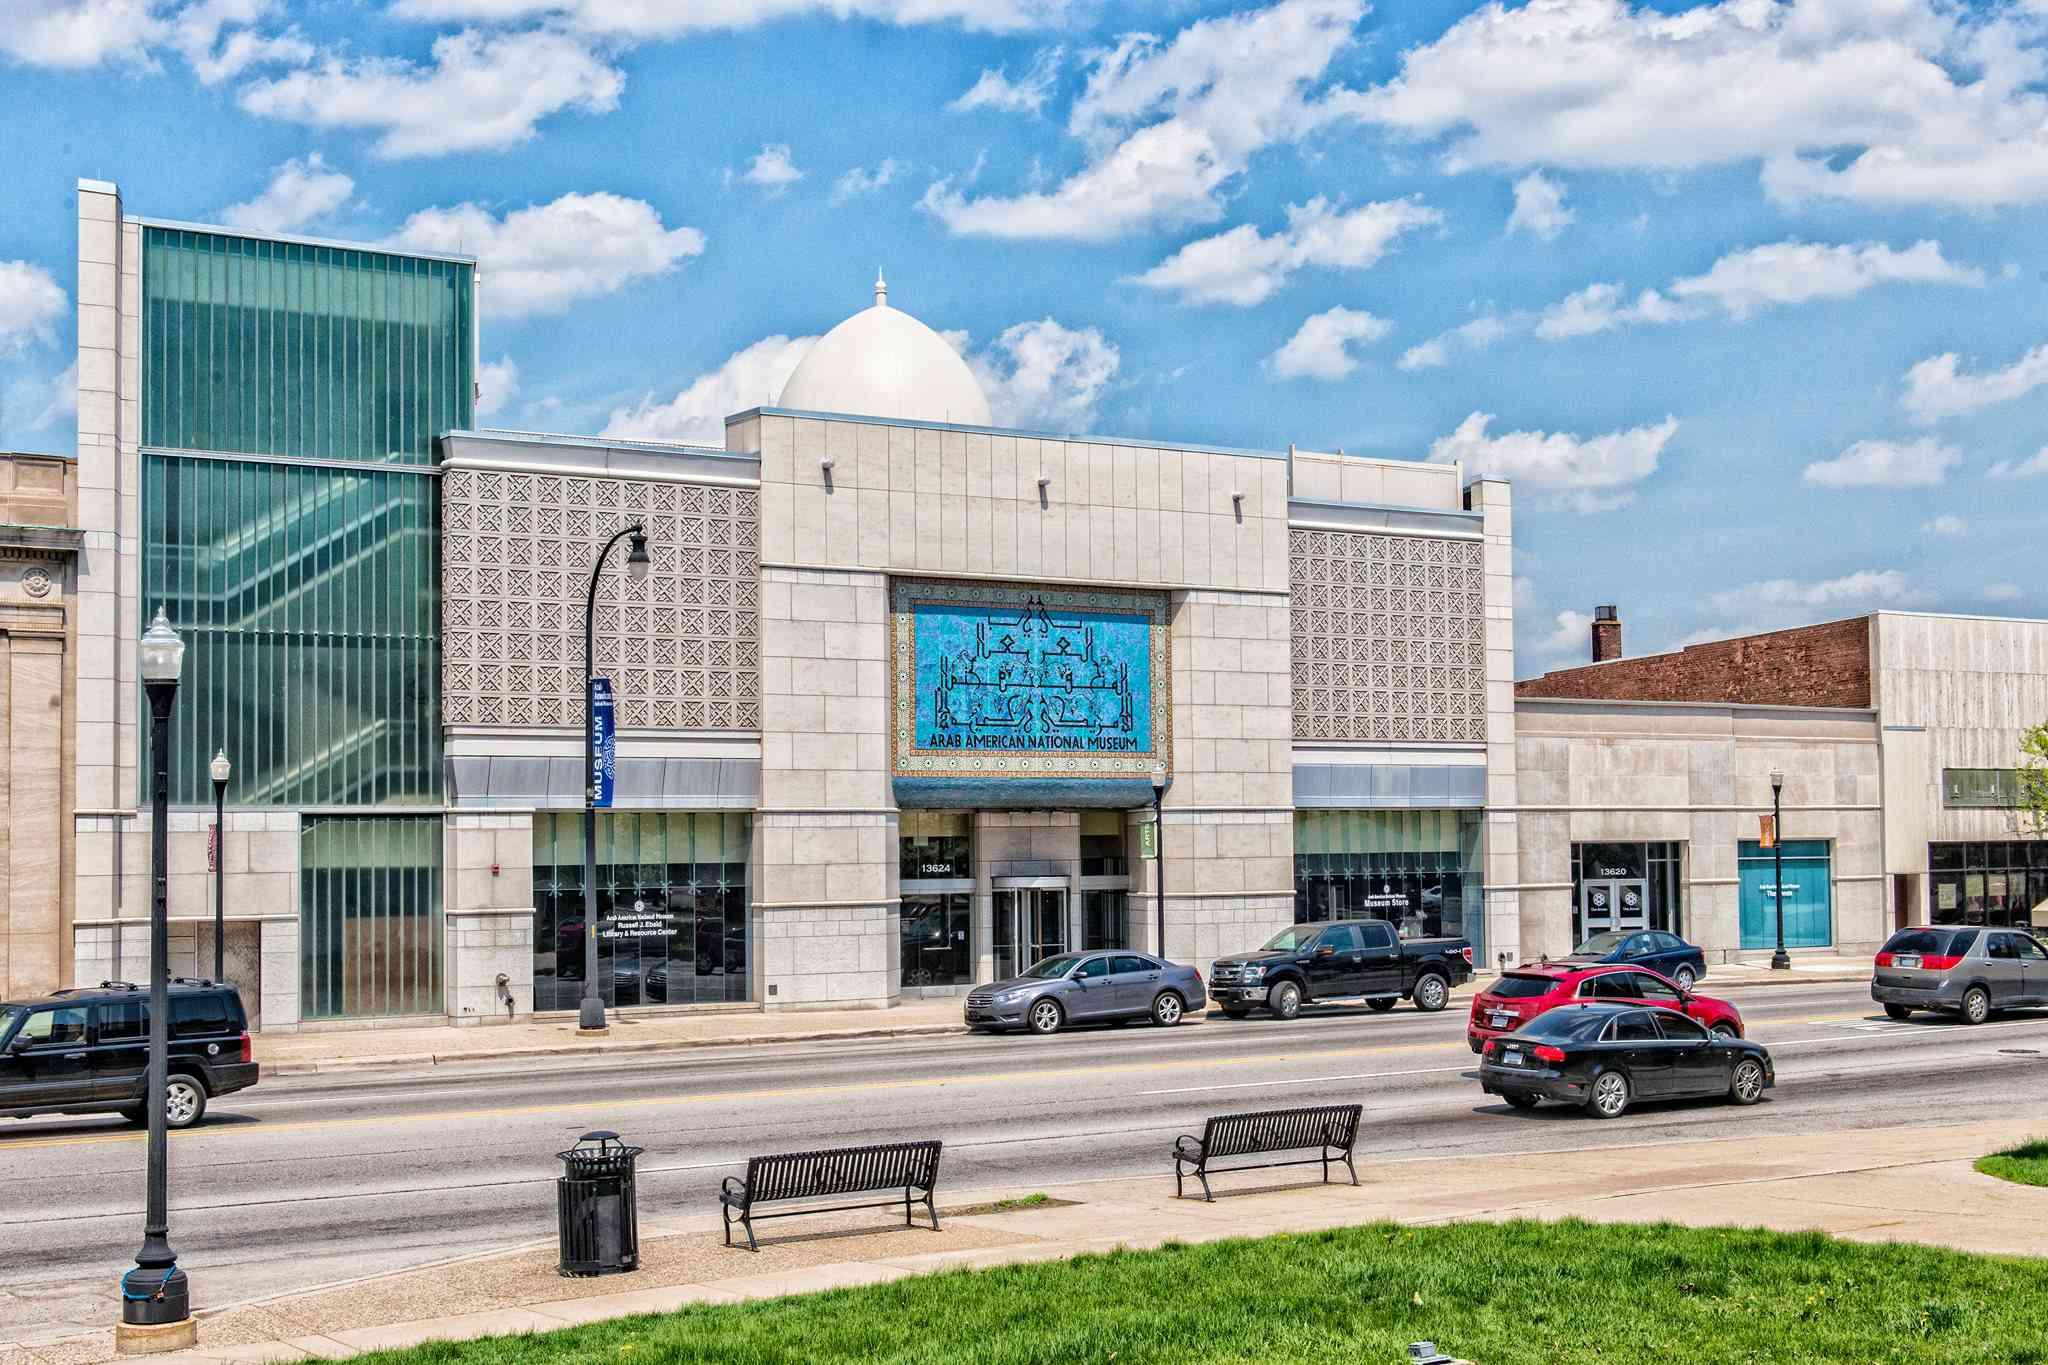 Exterior of Arab American National Museum in Detroit